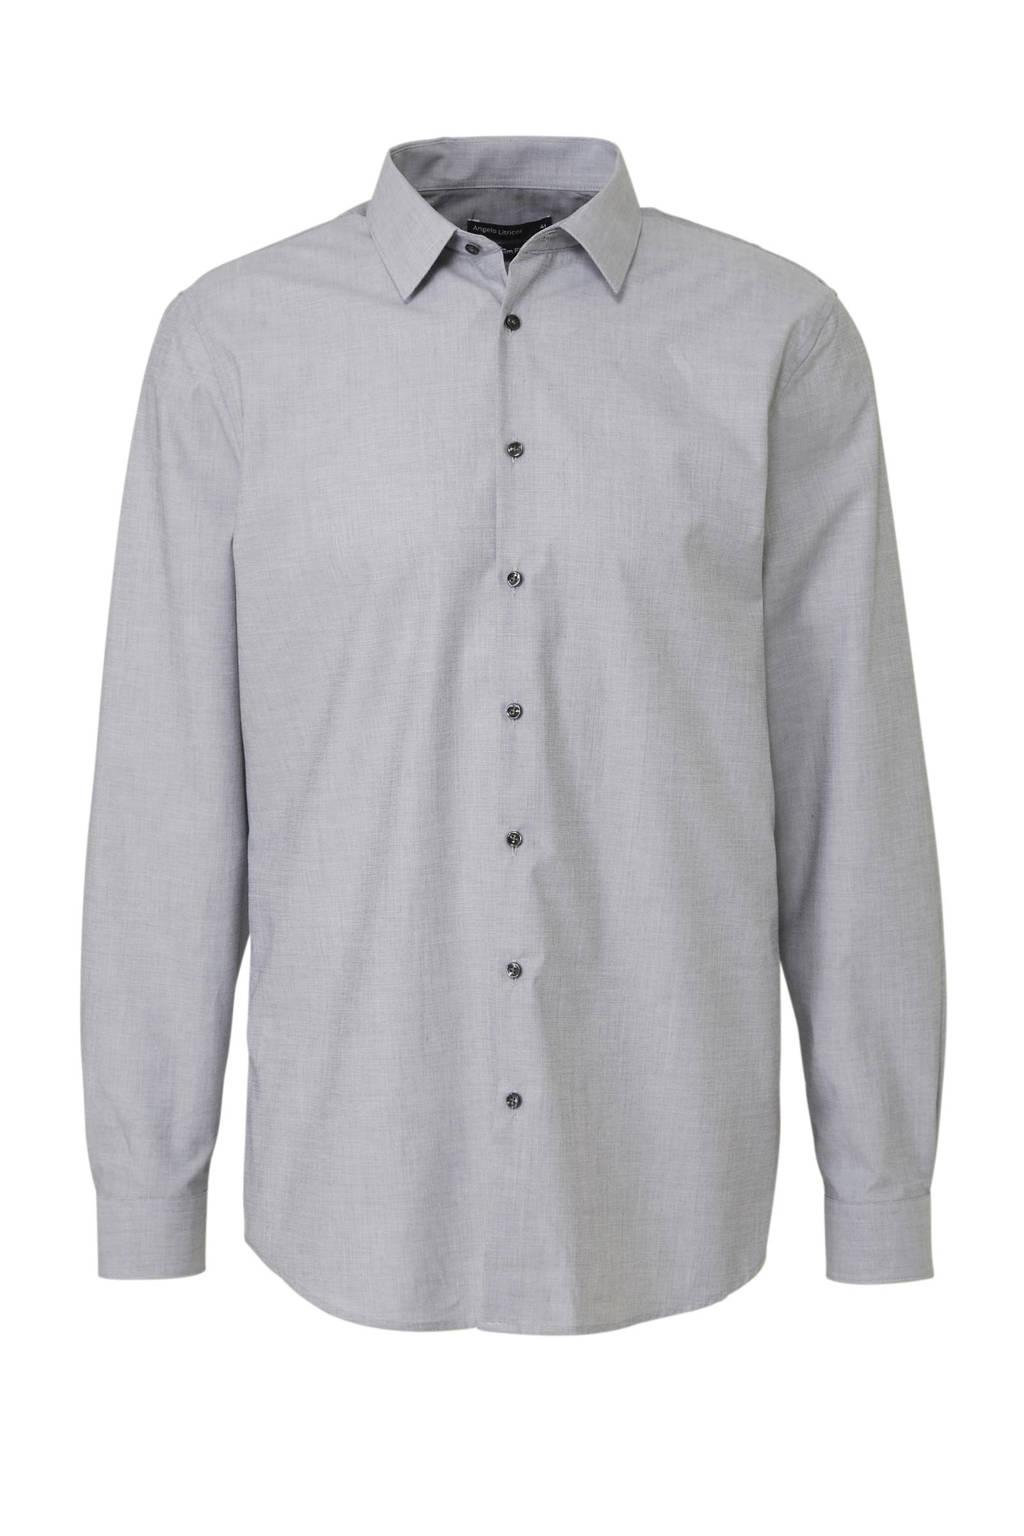 C&A Angelo Litrico slim fit overhemd, Grijs